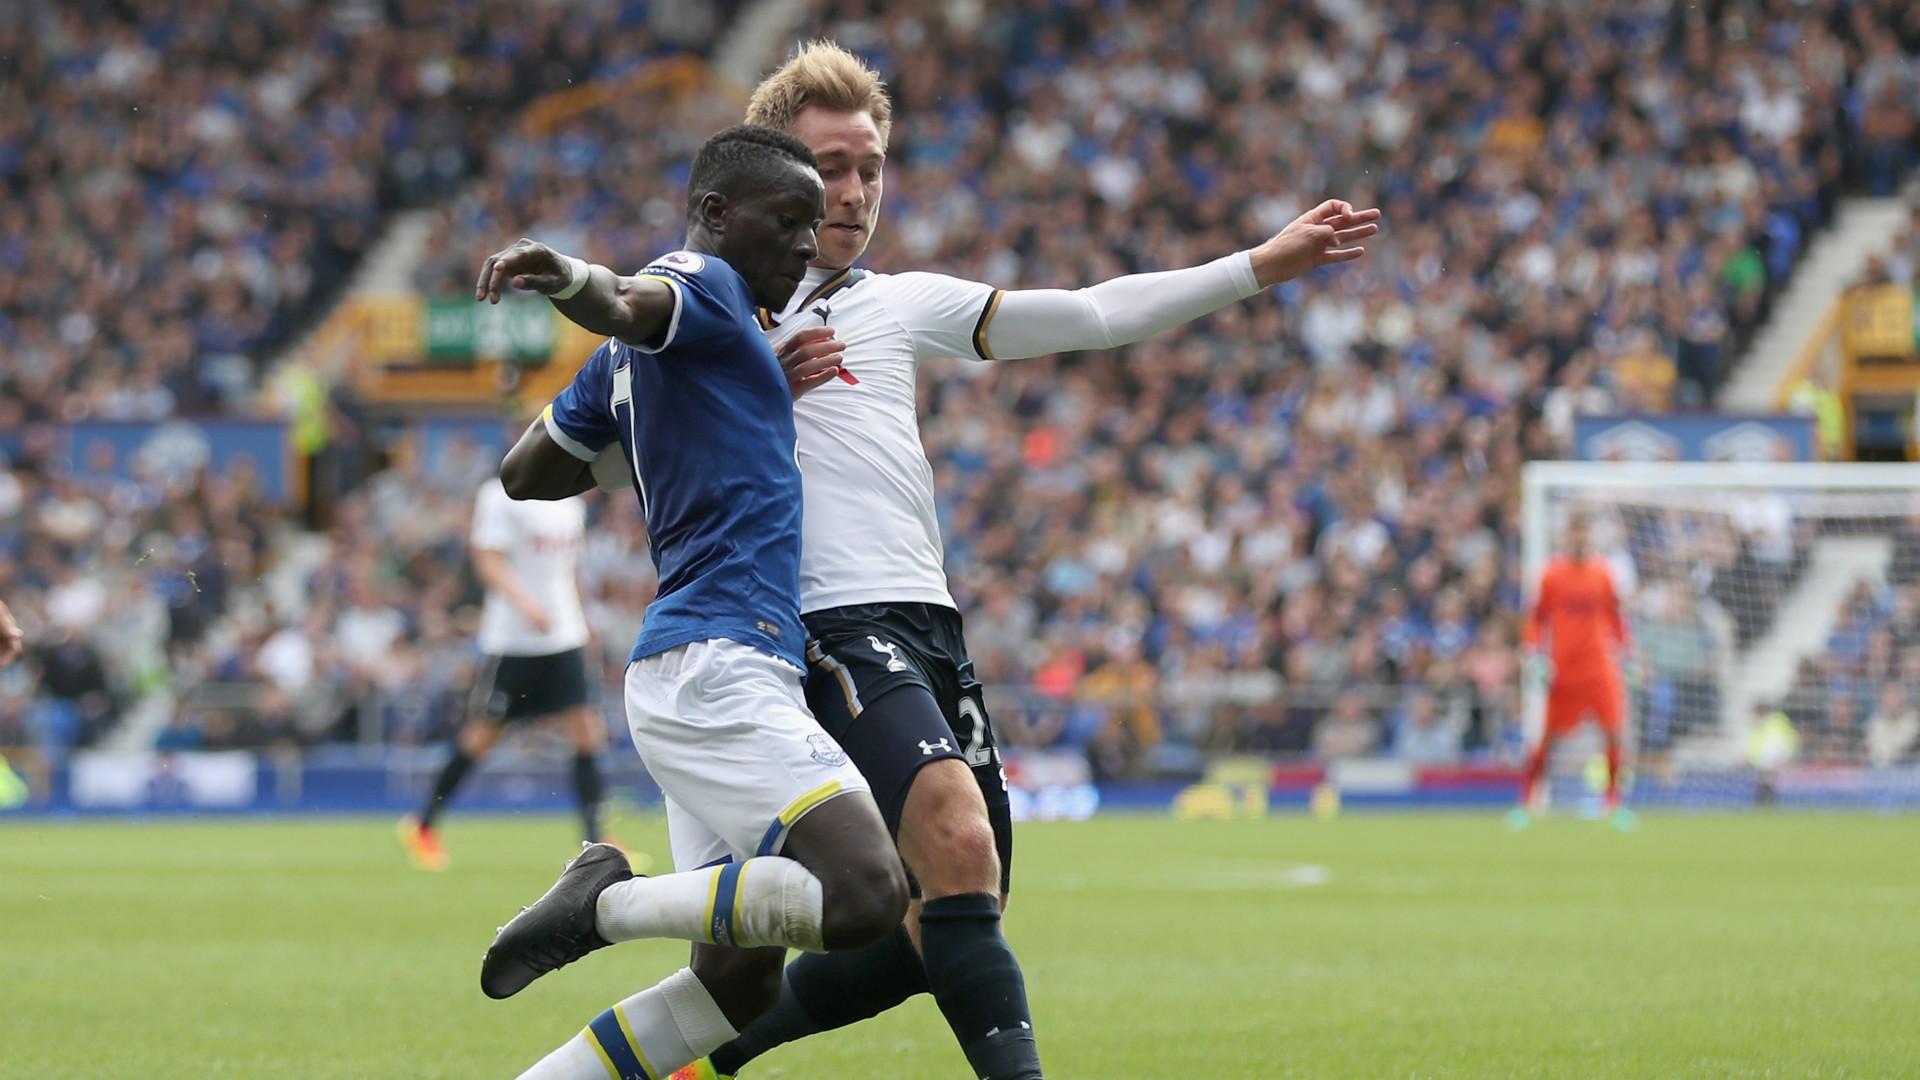 HD Idrissa Gana Gueye Christian Eriksen Everton Tottenham